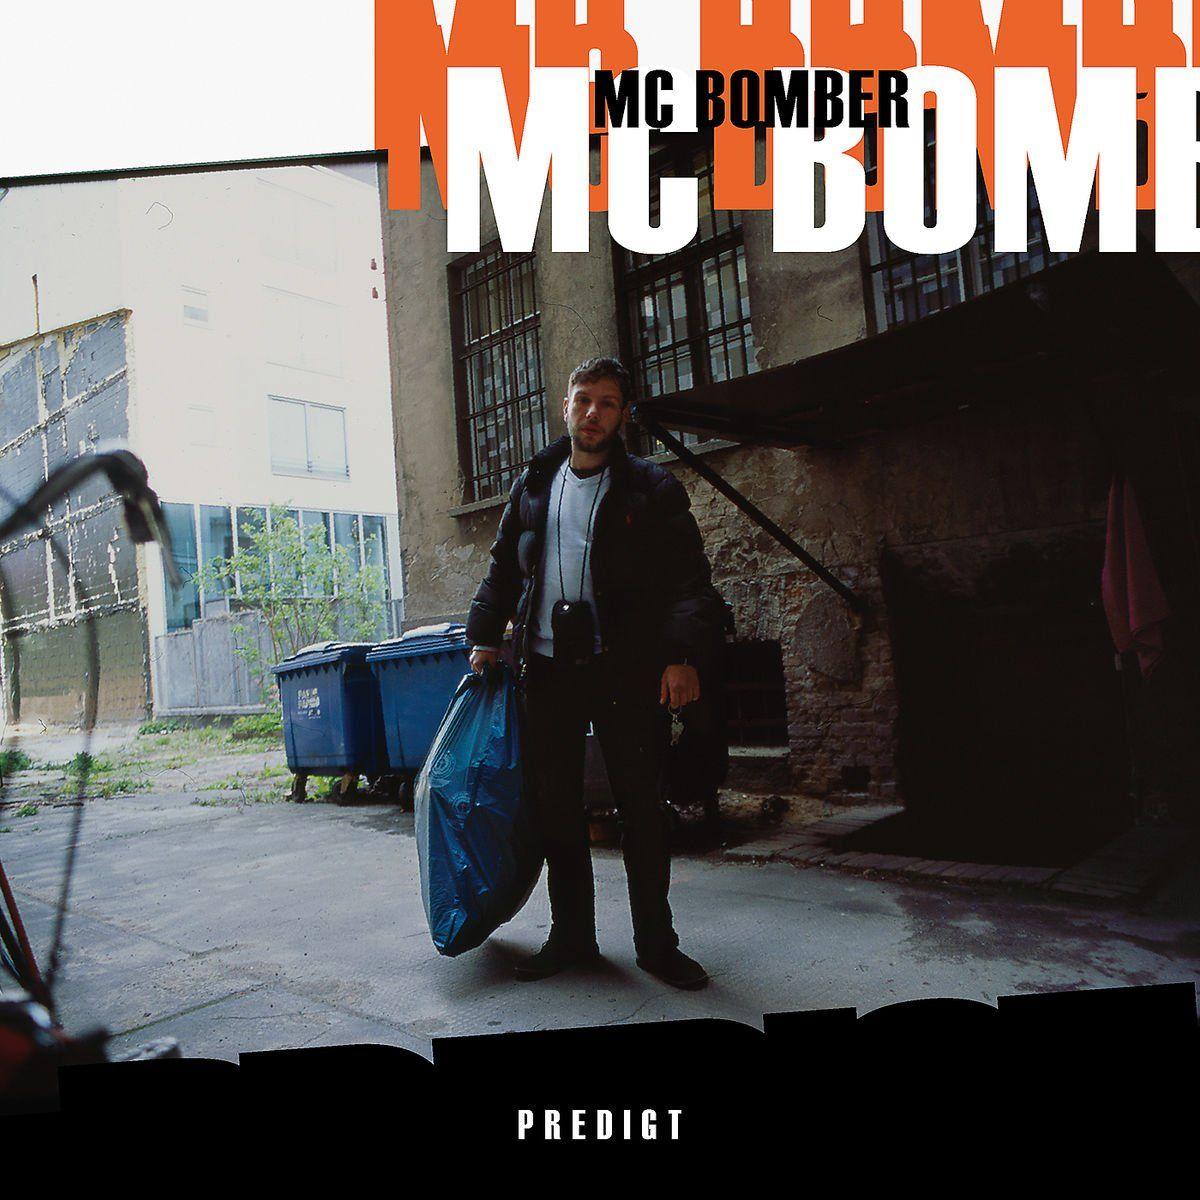 MC Bomber - Predigt